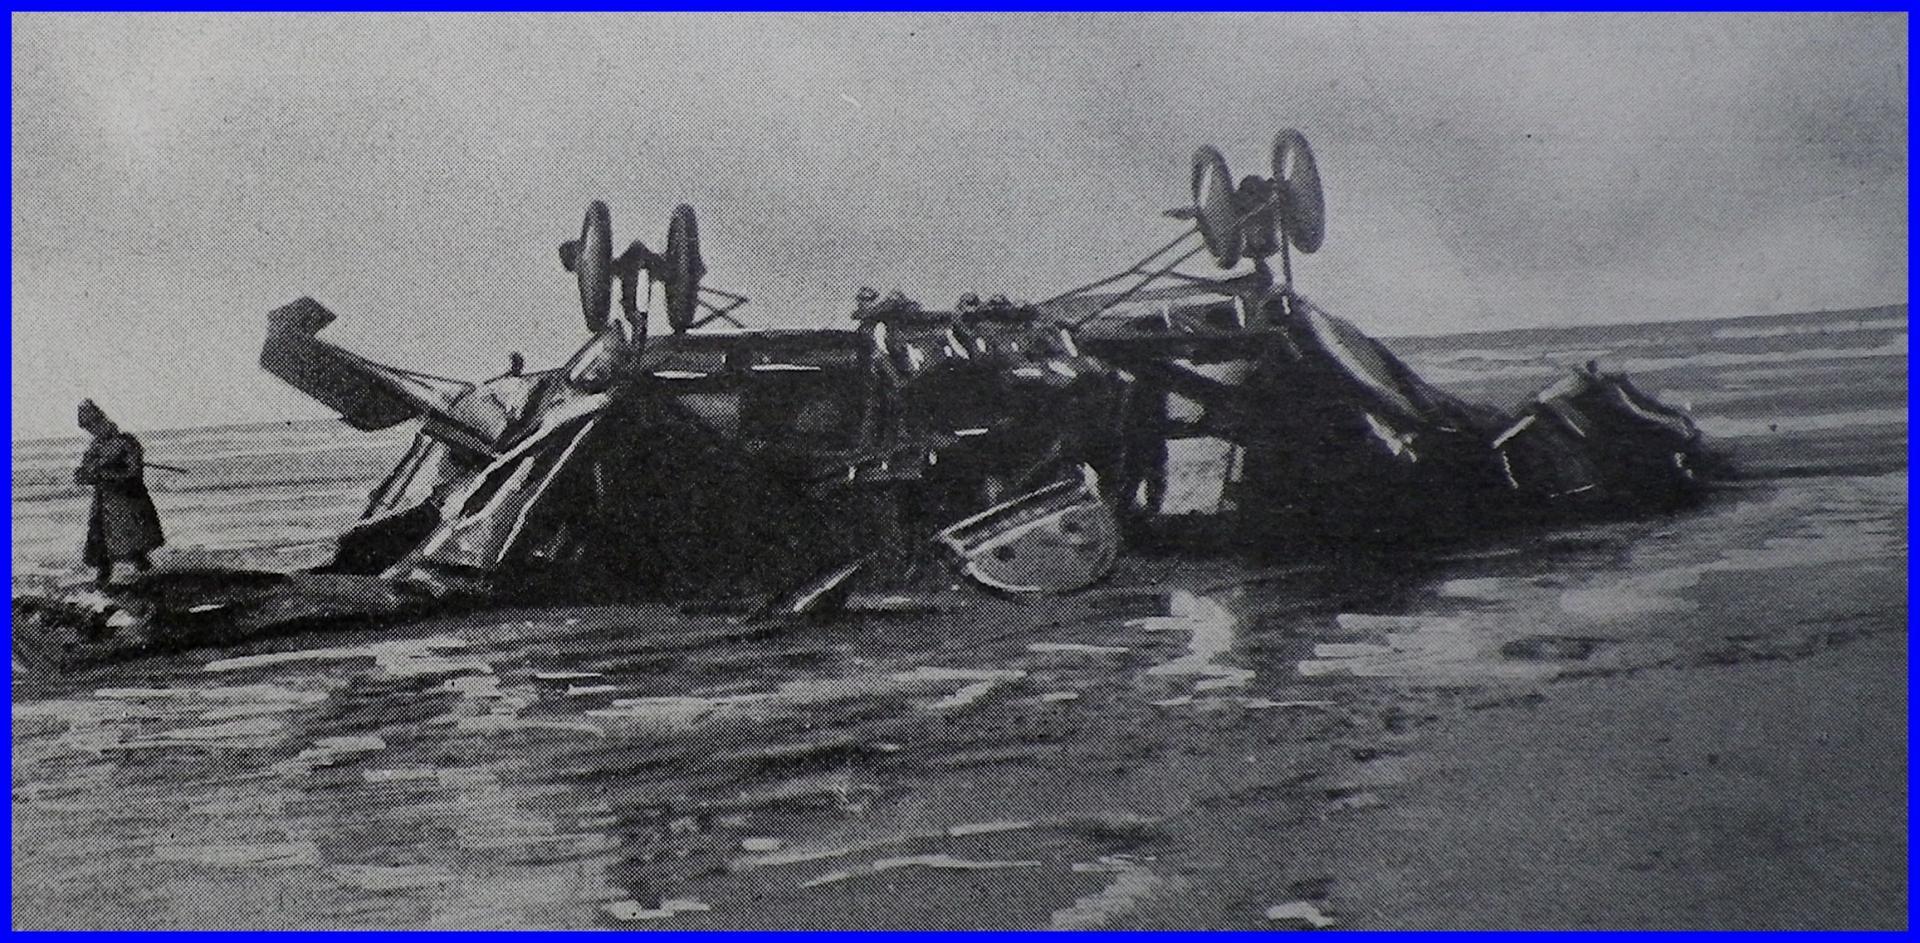 Calais 14 18 avion abattu encadre